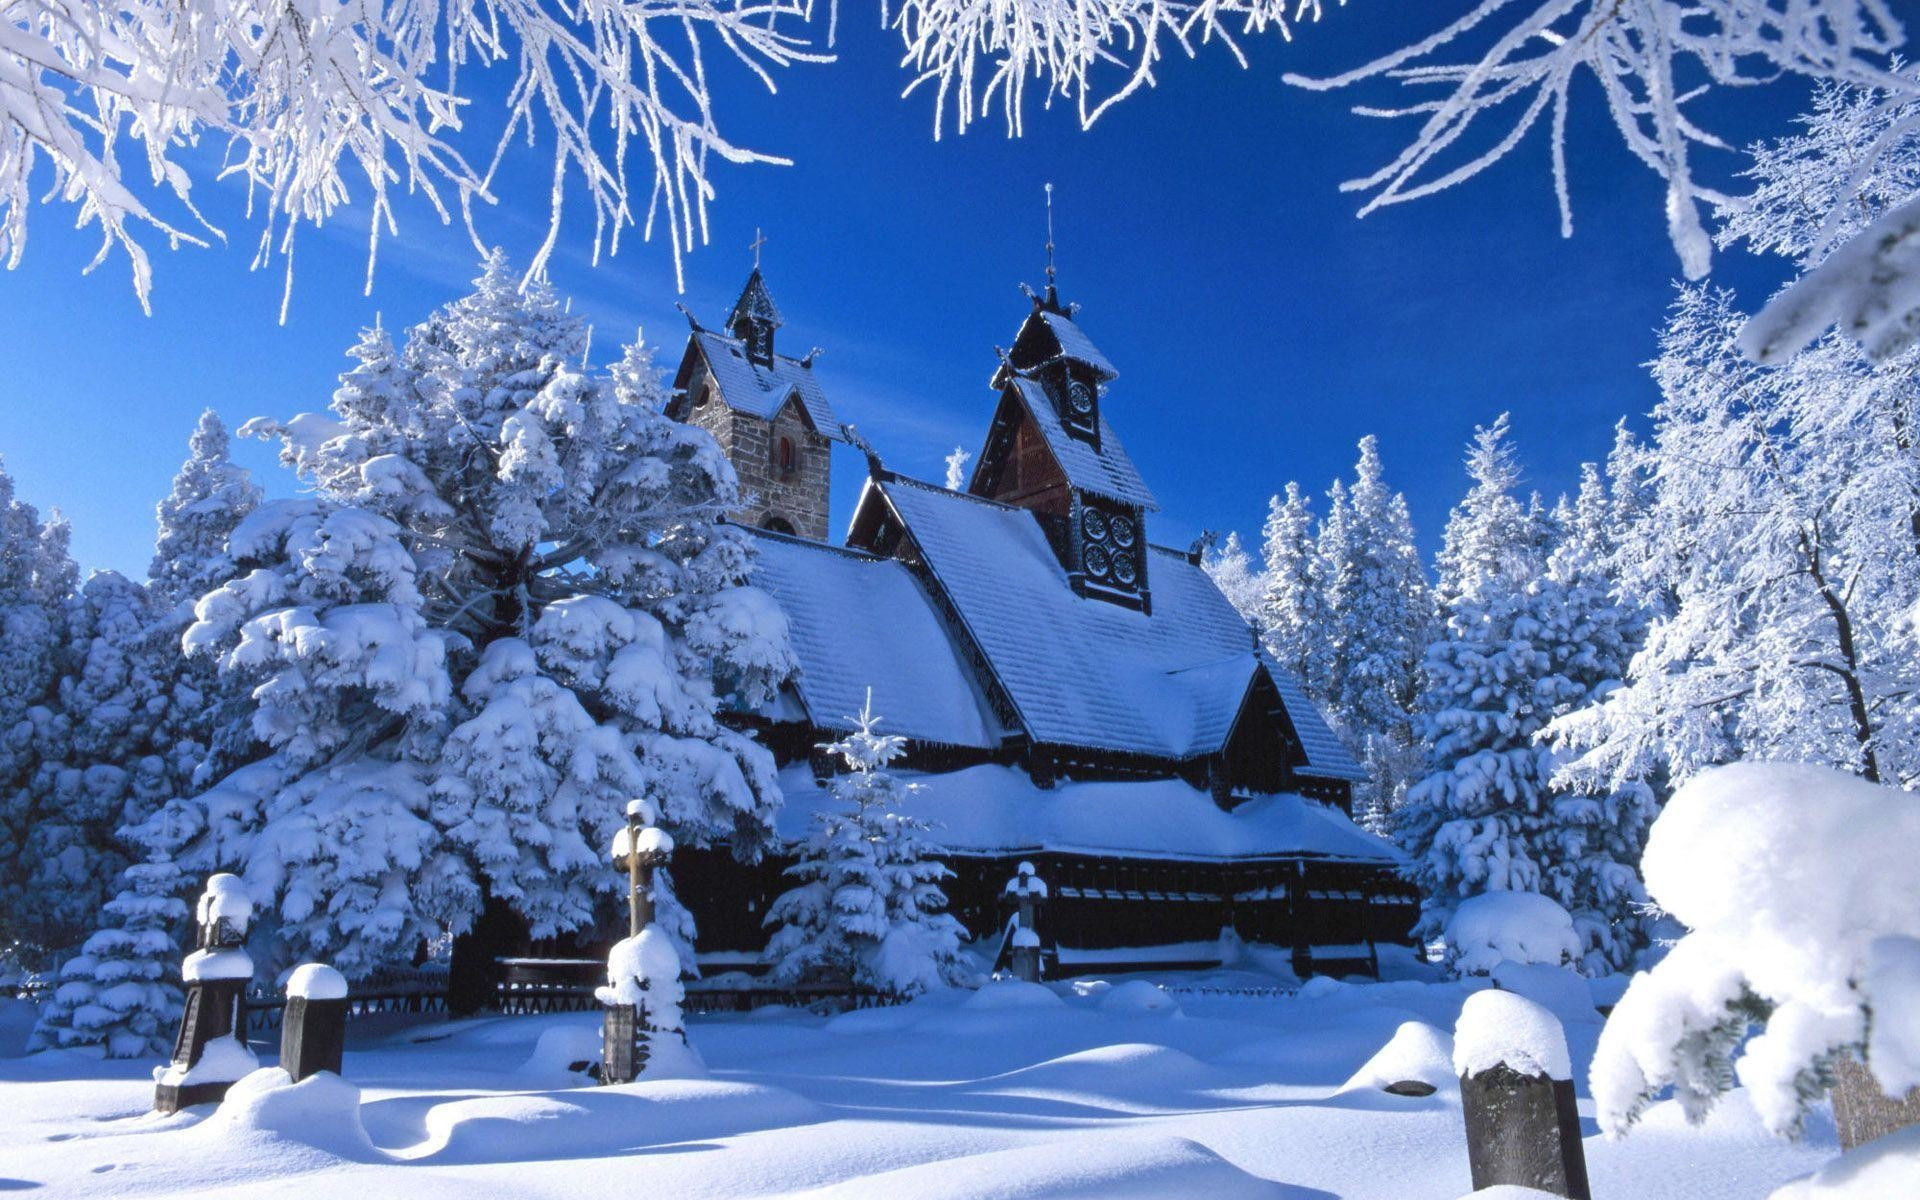 Christmas Winter Scenes Design Ideas ~ Winter Scene Wallpaper .